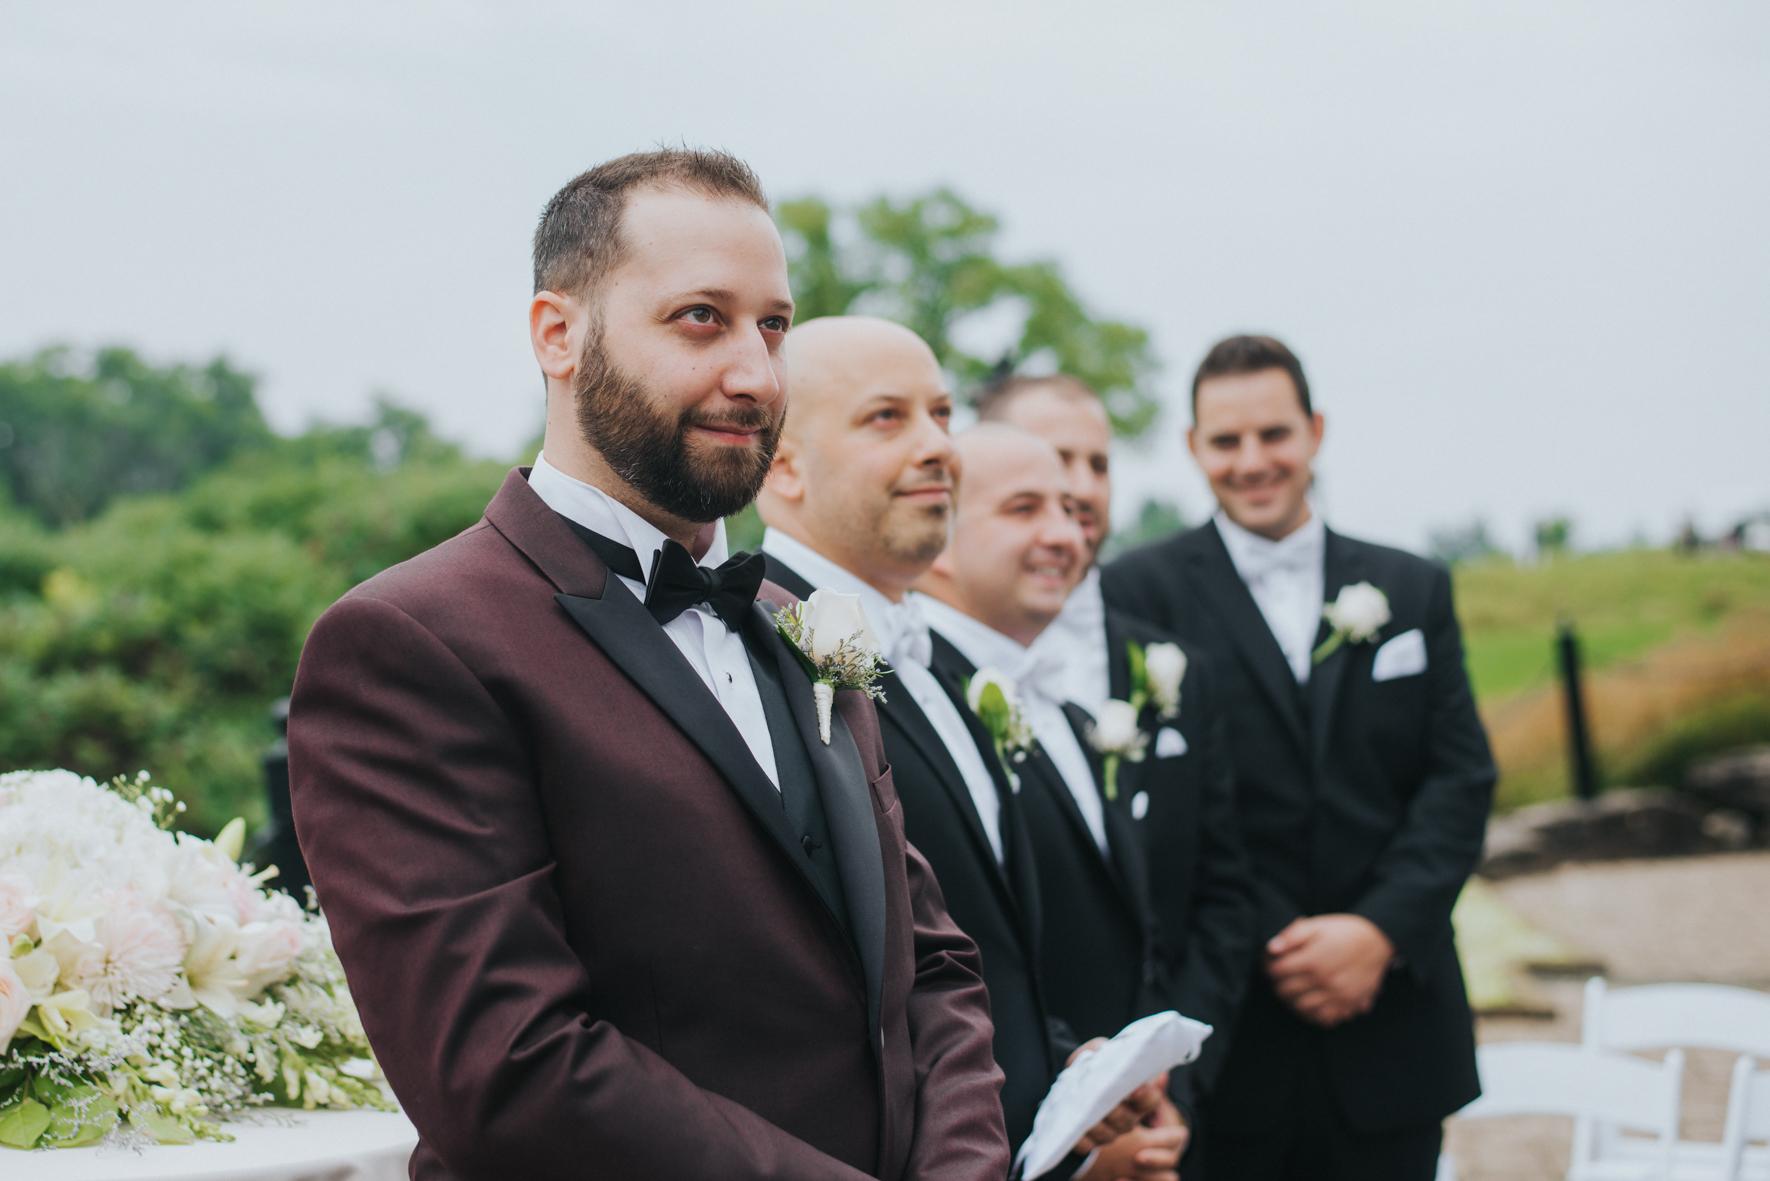 sandy-jana-copper-creek-golf-club-slovak-wedding-toronto-scandaleuse-photography-weddings-13.jpg